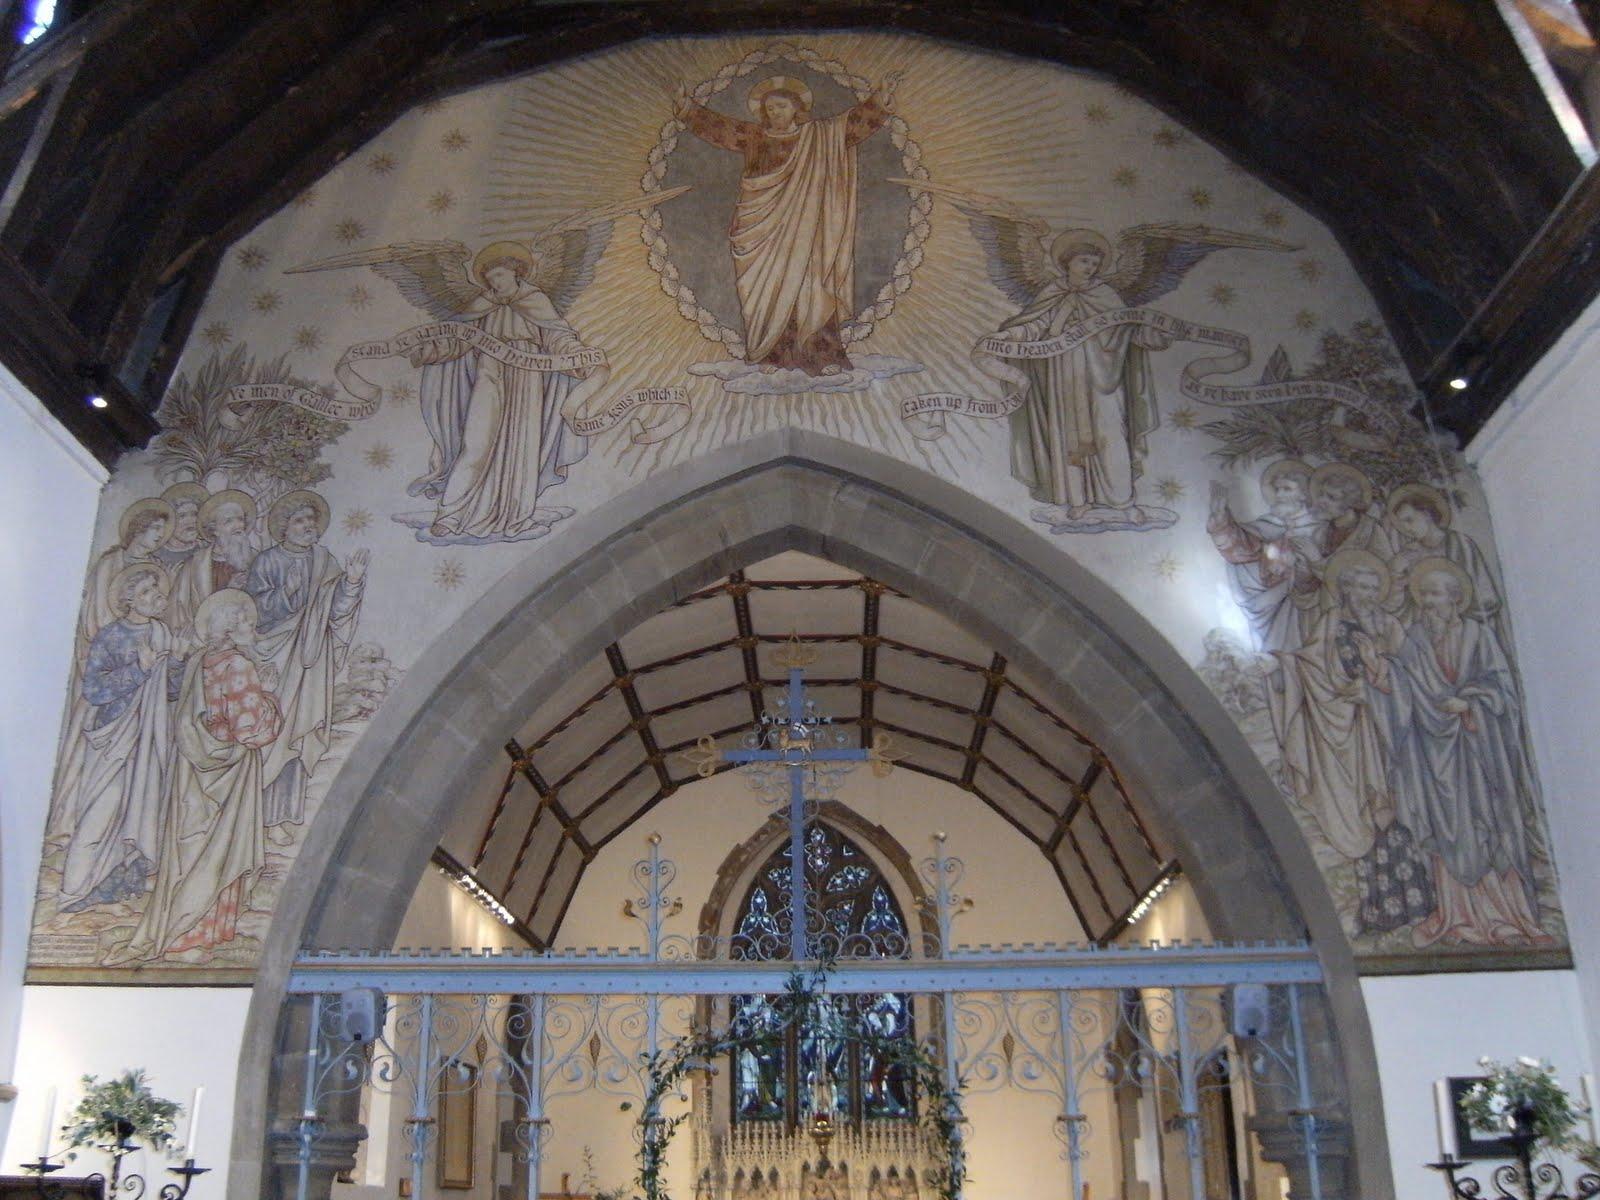 DSCF1916 St Peter's church, Tandridge